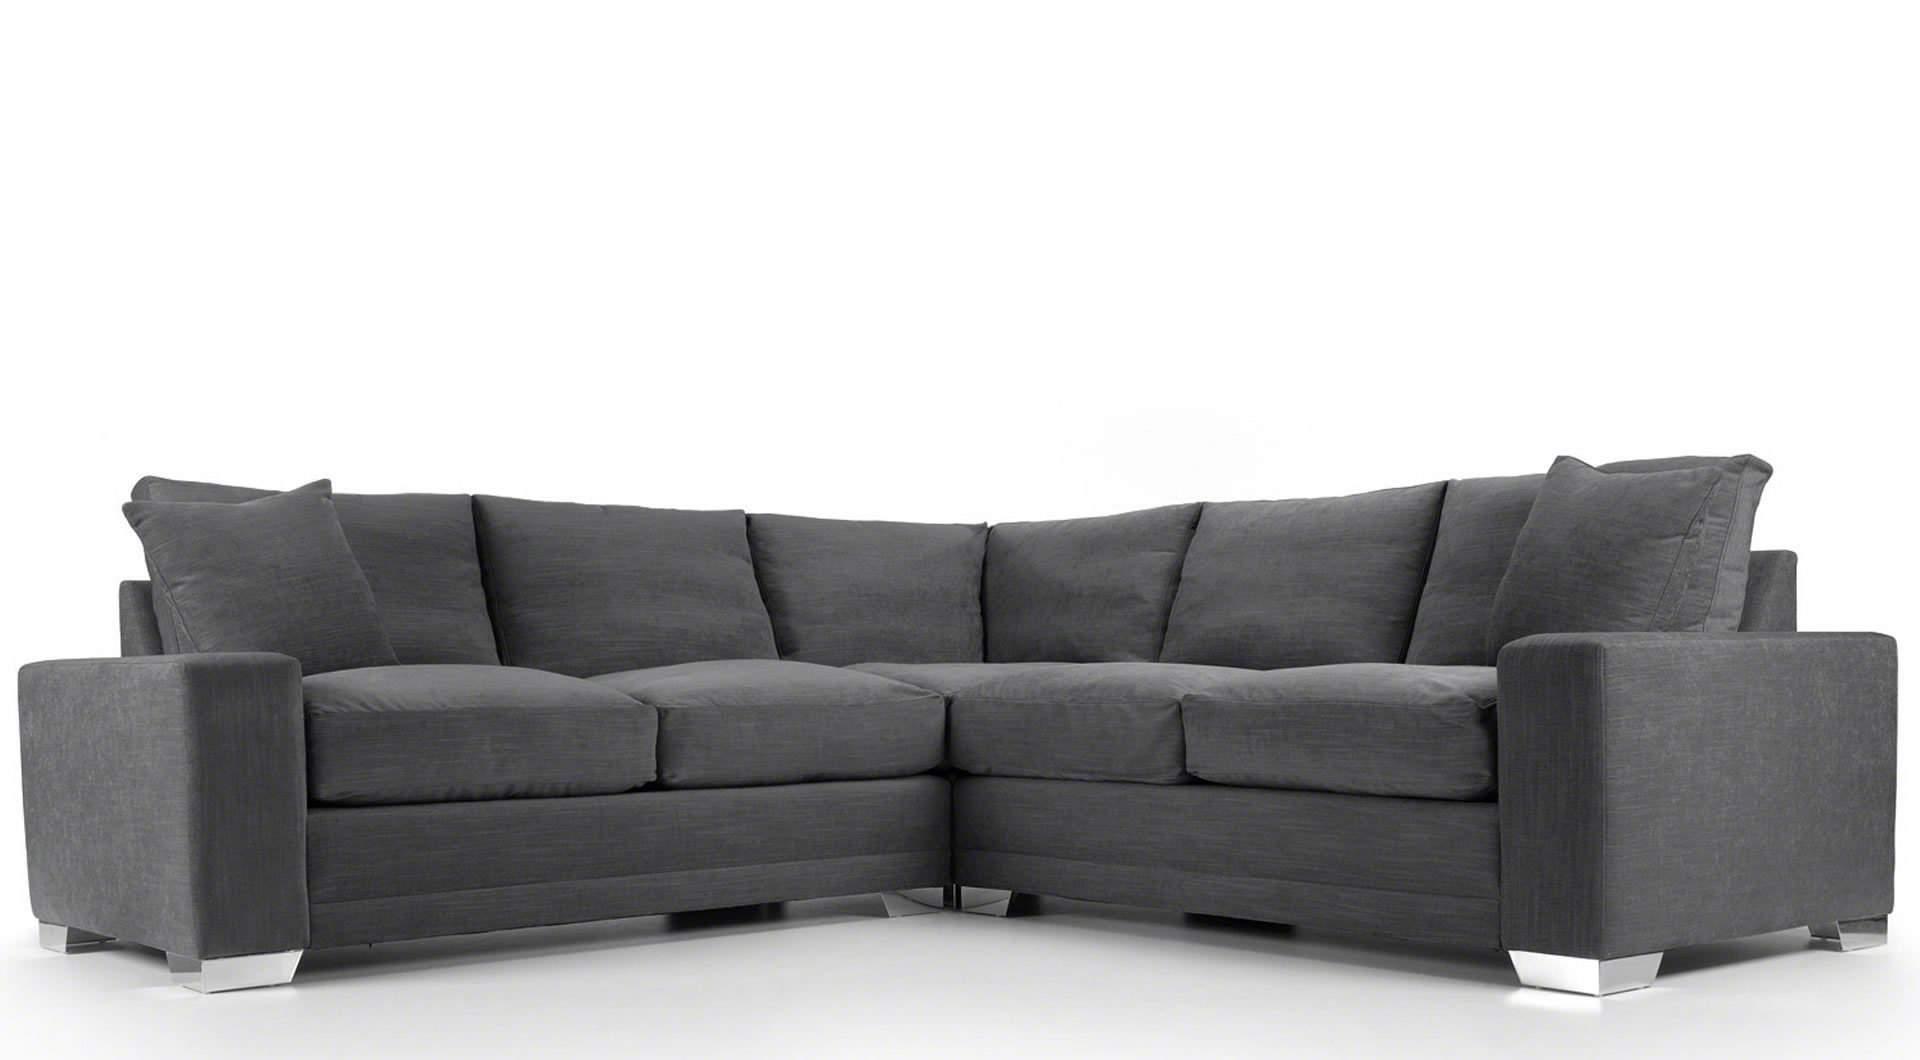 corner sofa bed roma grey huge italian white leather modern sectional set soho 2 5 sofabed dark mysmallspace